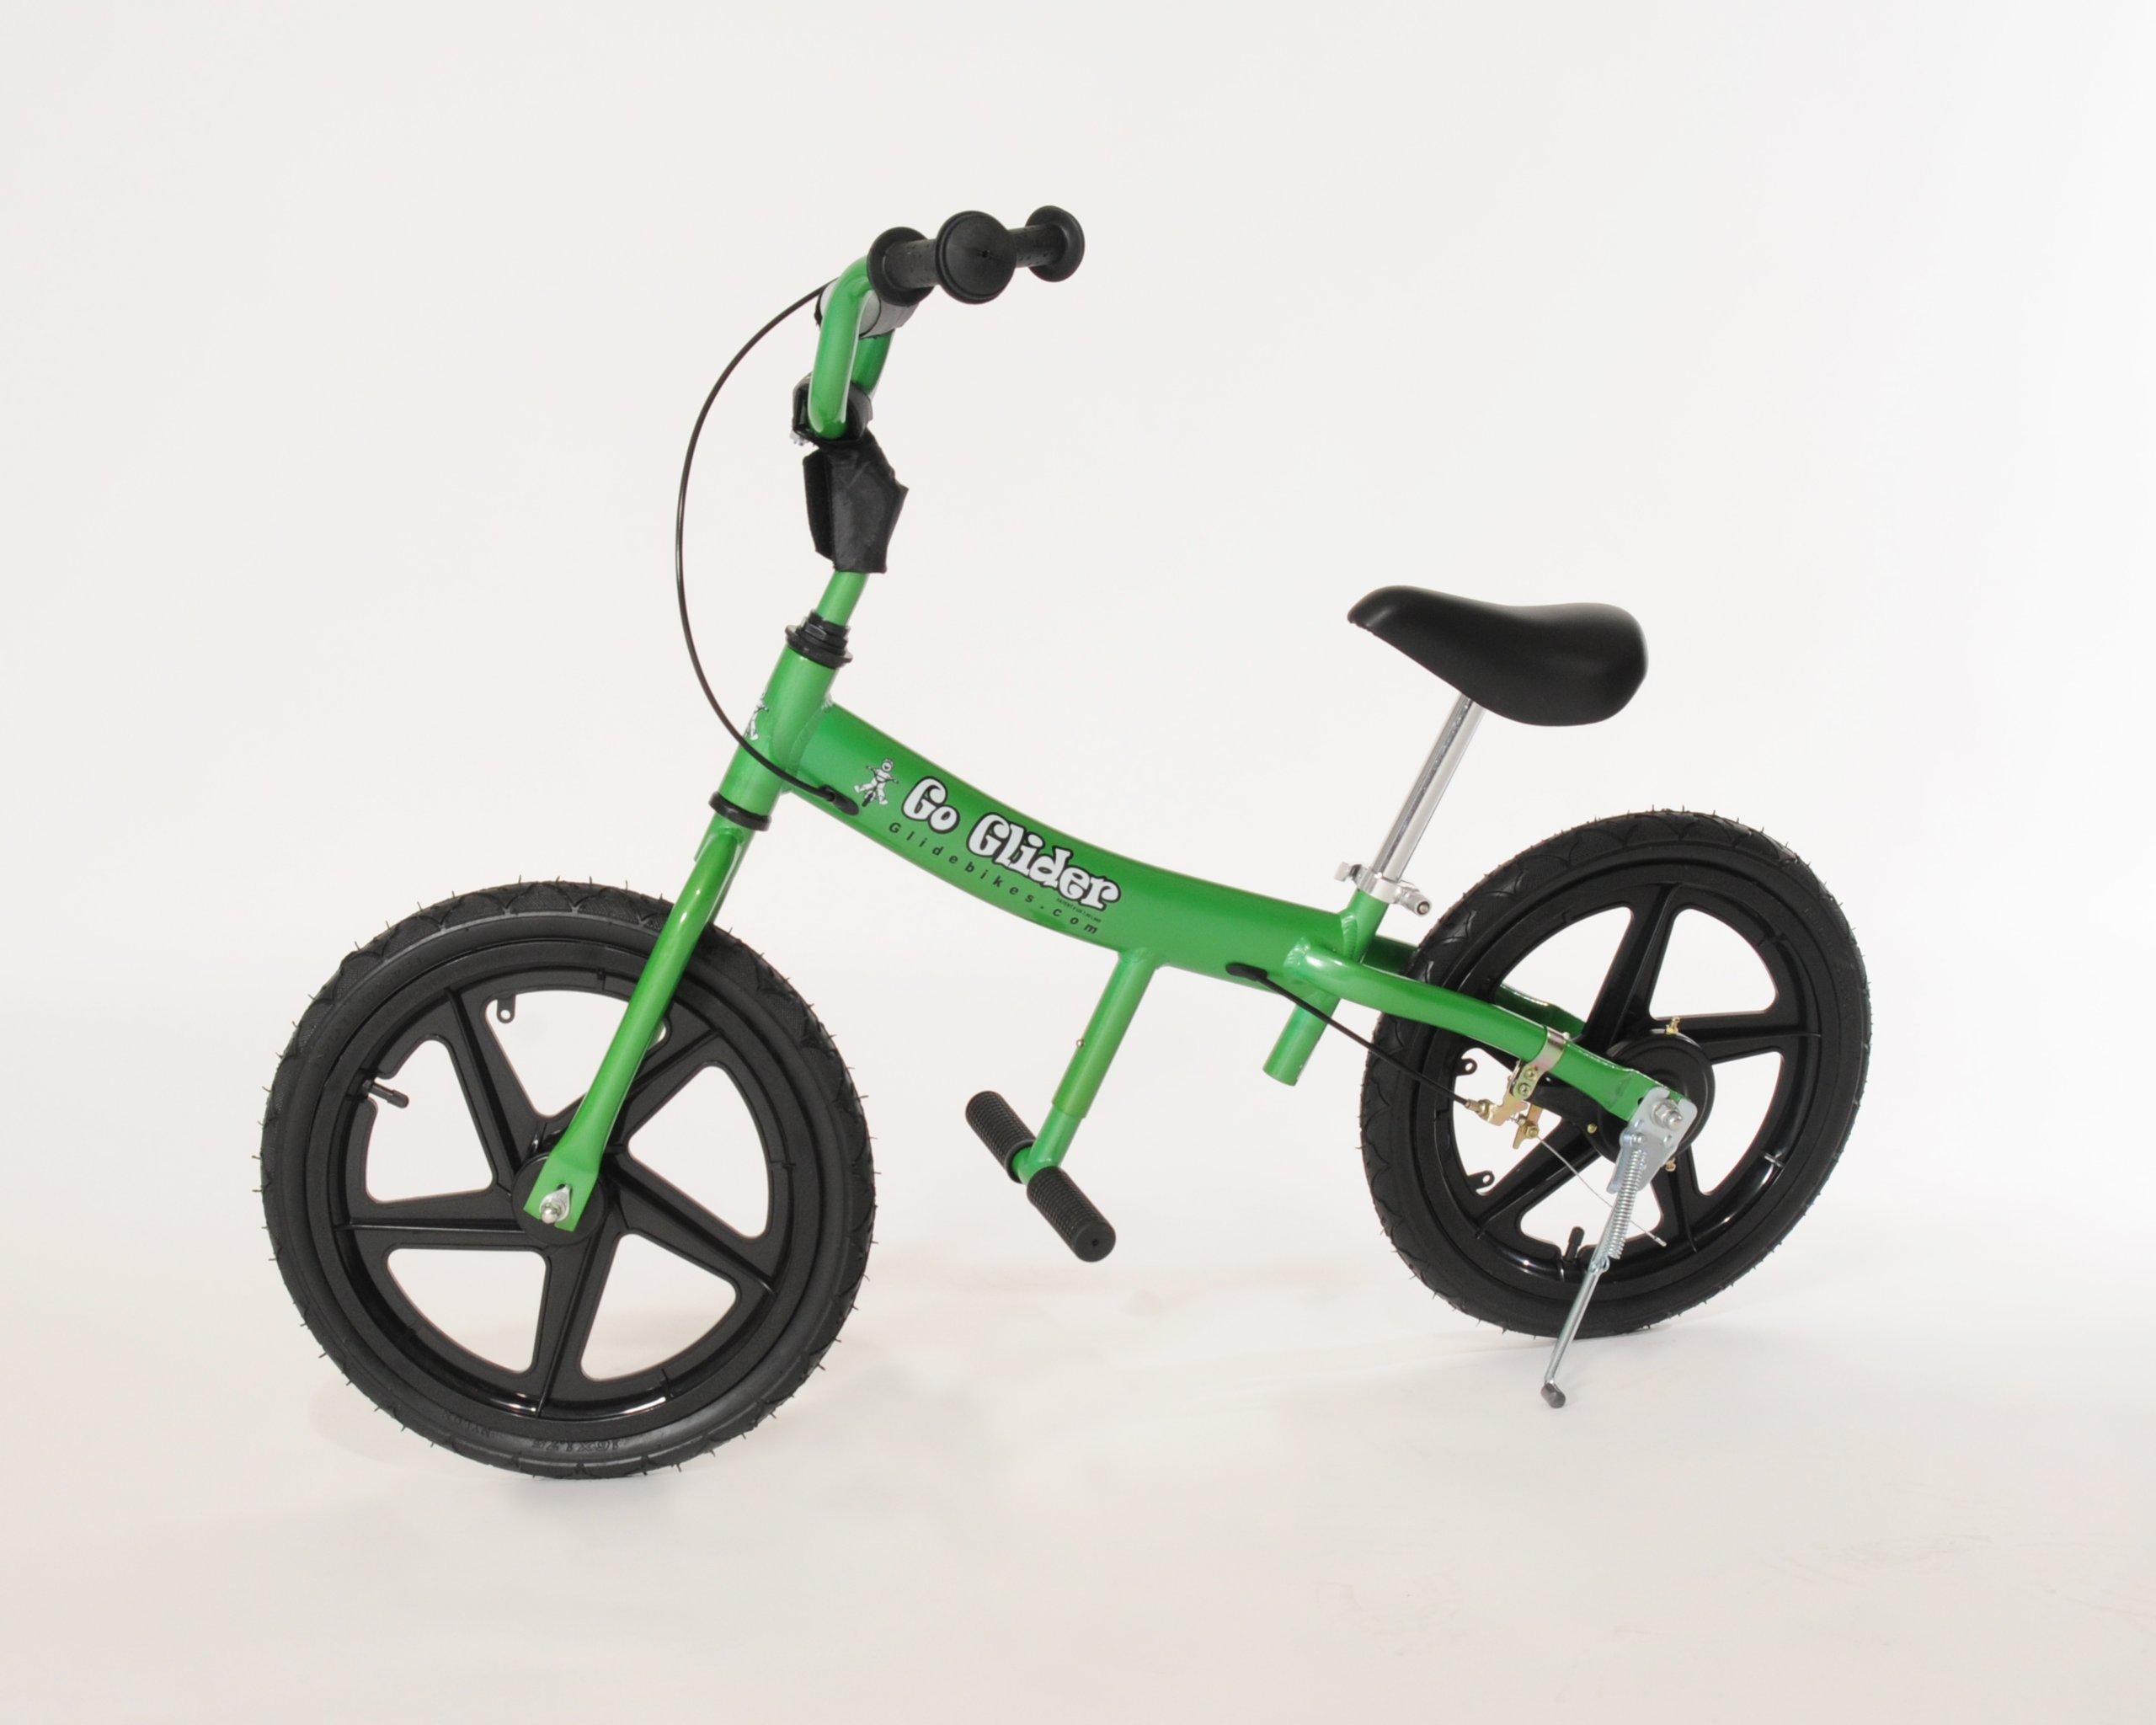 Glide Bikes Kid's Go Glider Balance Bike, Green, 16-Inch by Glide Bikes (Image #1)